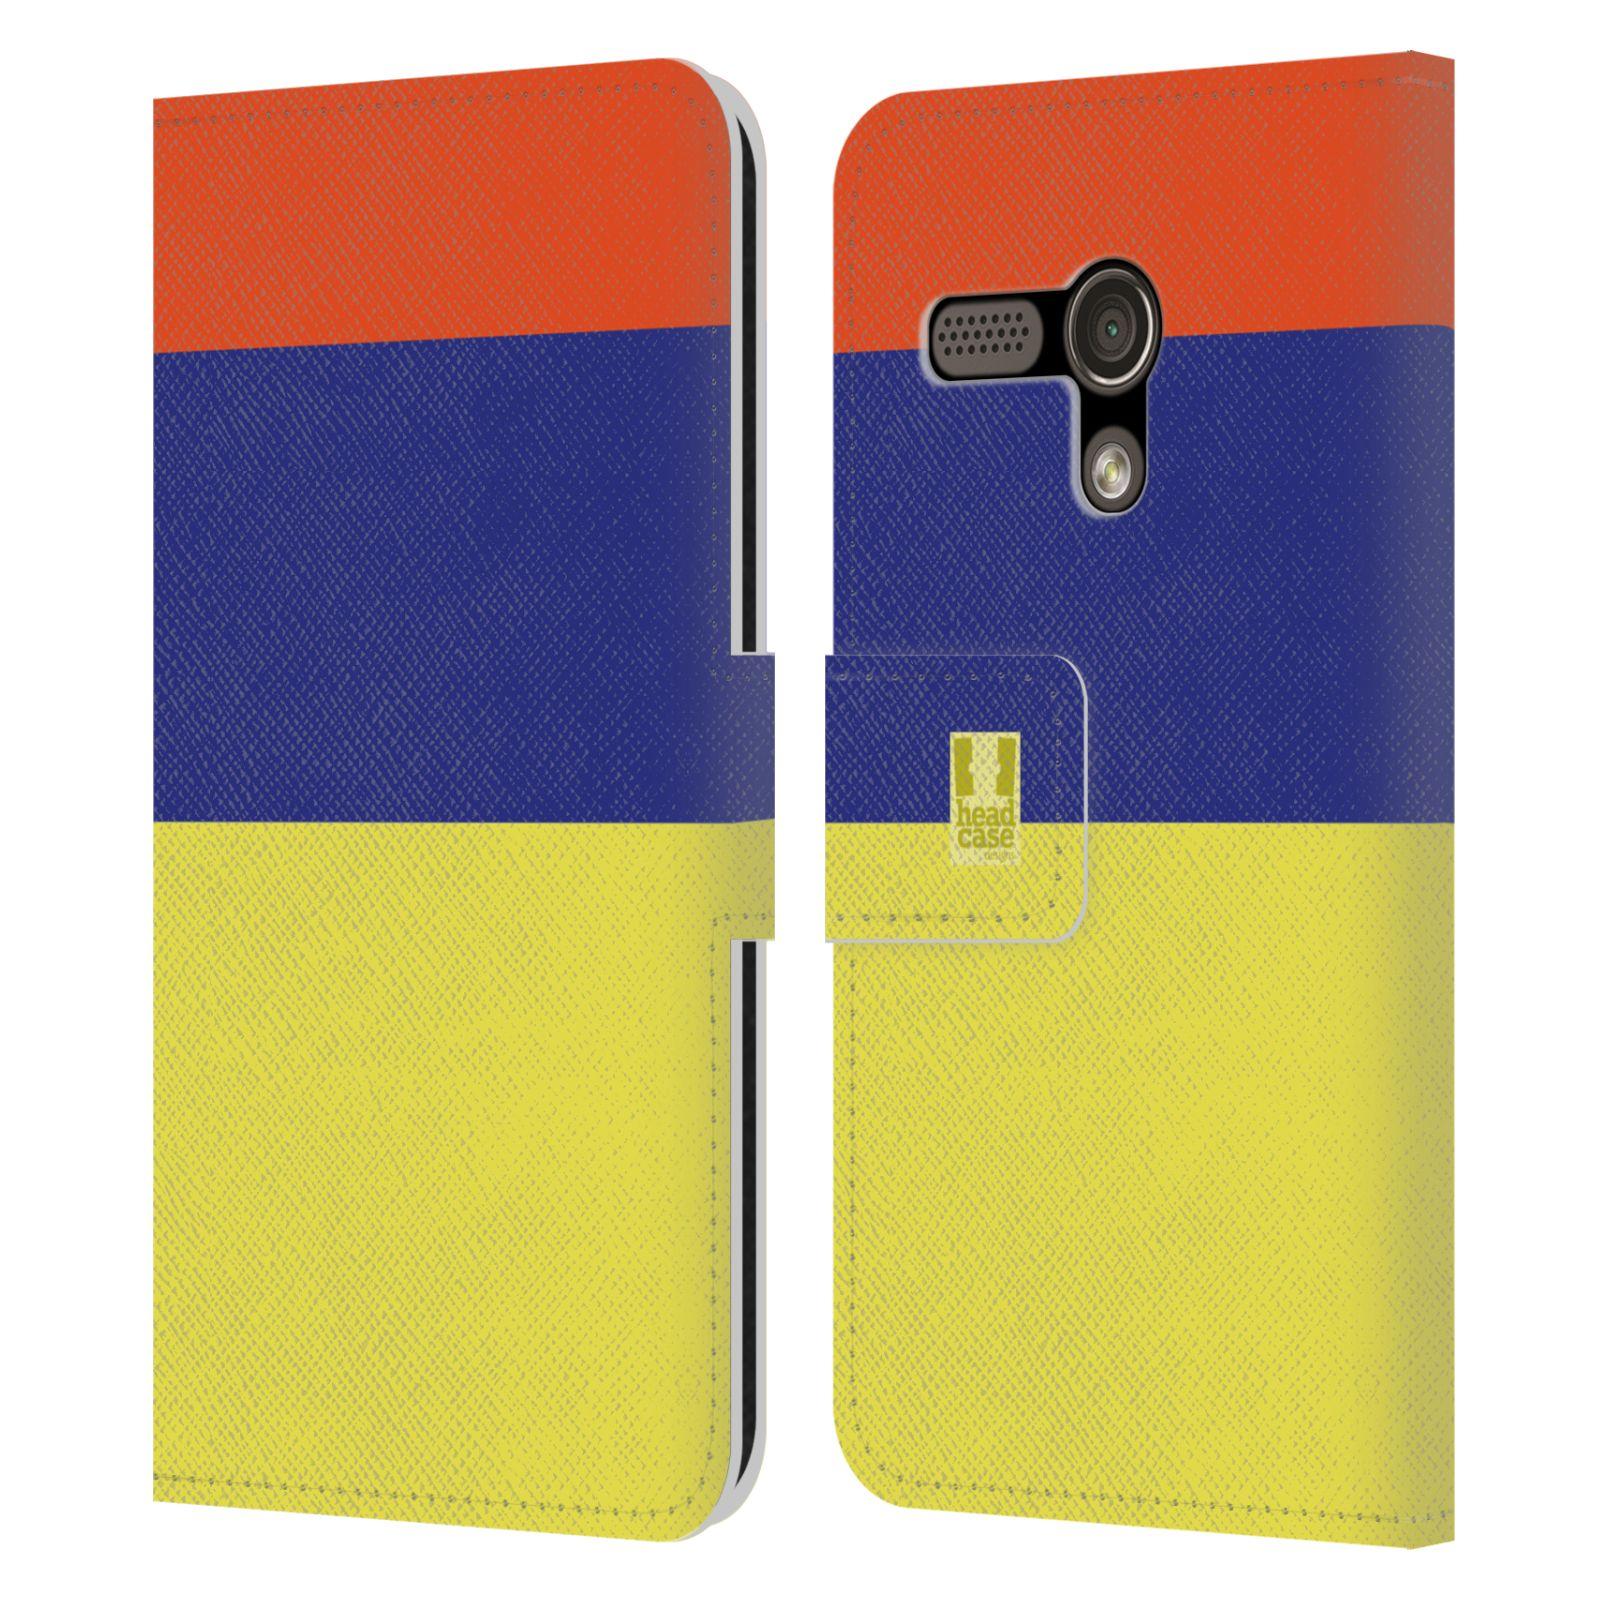 HEAD CASE Flipové pouzdro pro mobil Motorola MOTO G barevné tvary žlutá, modrá, červená